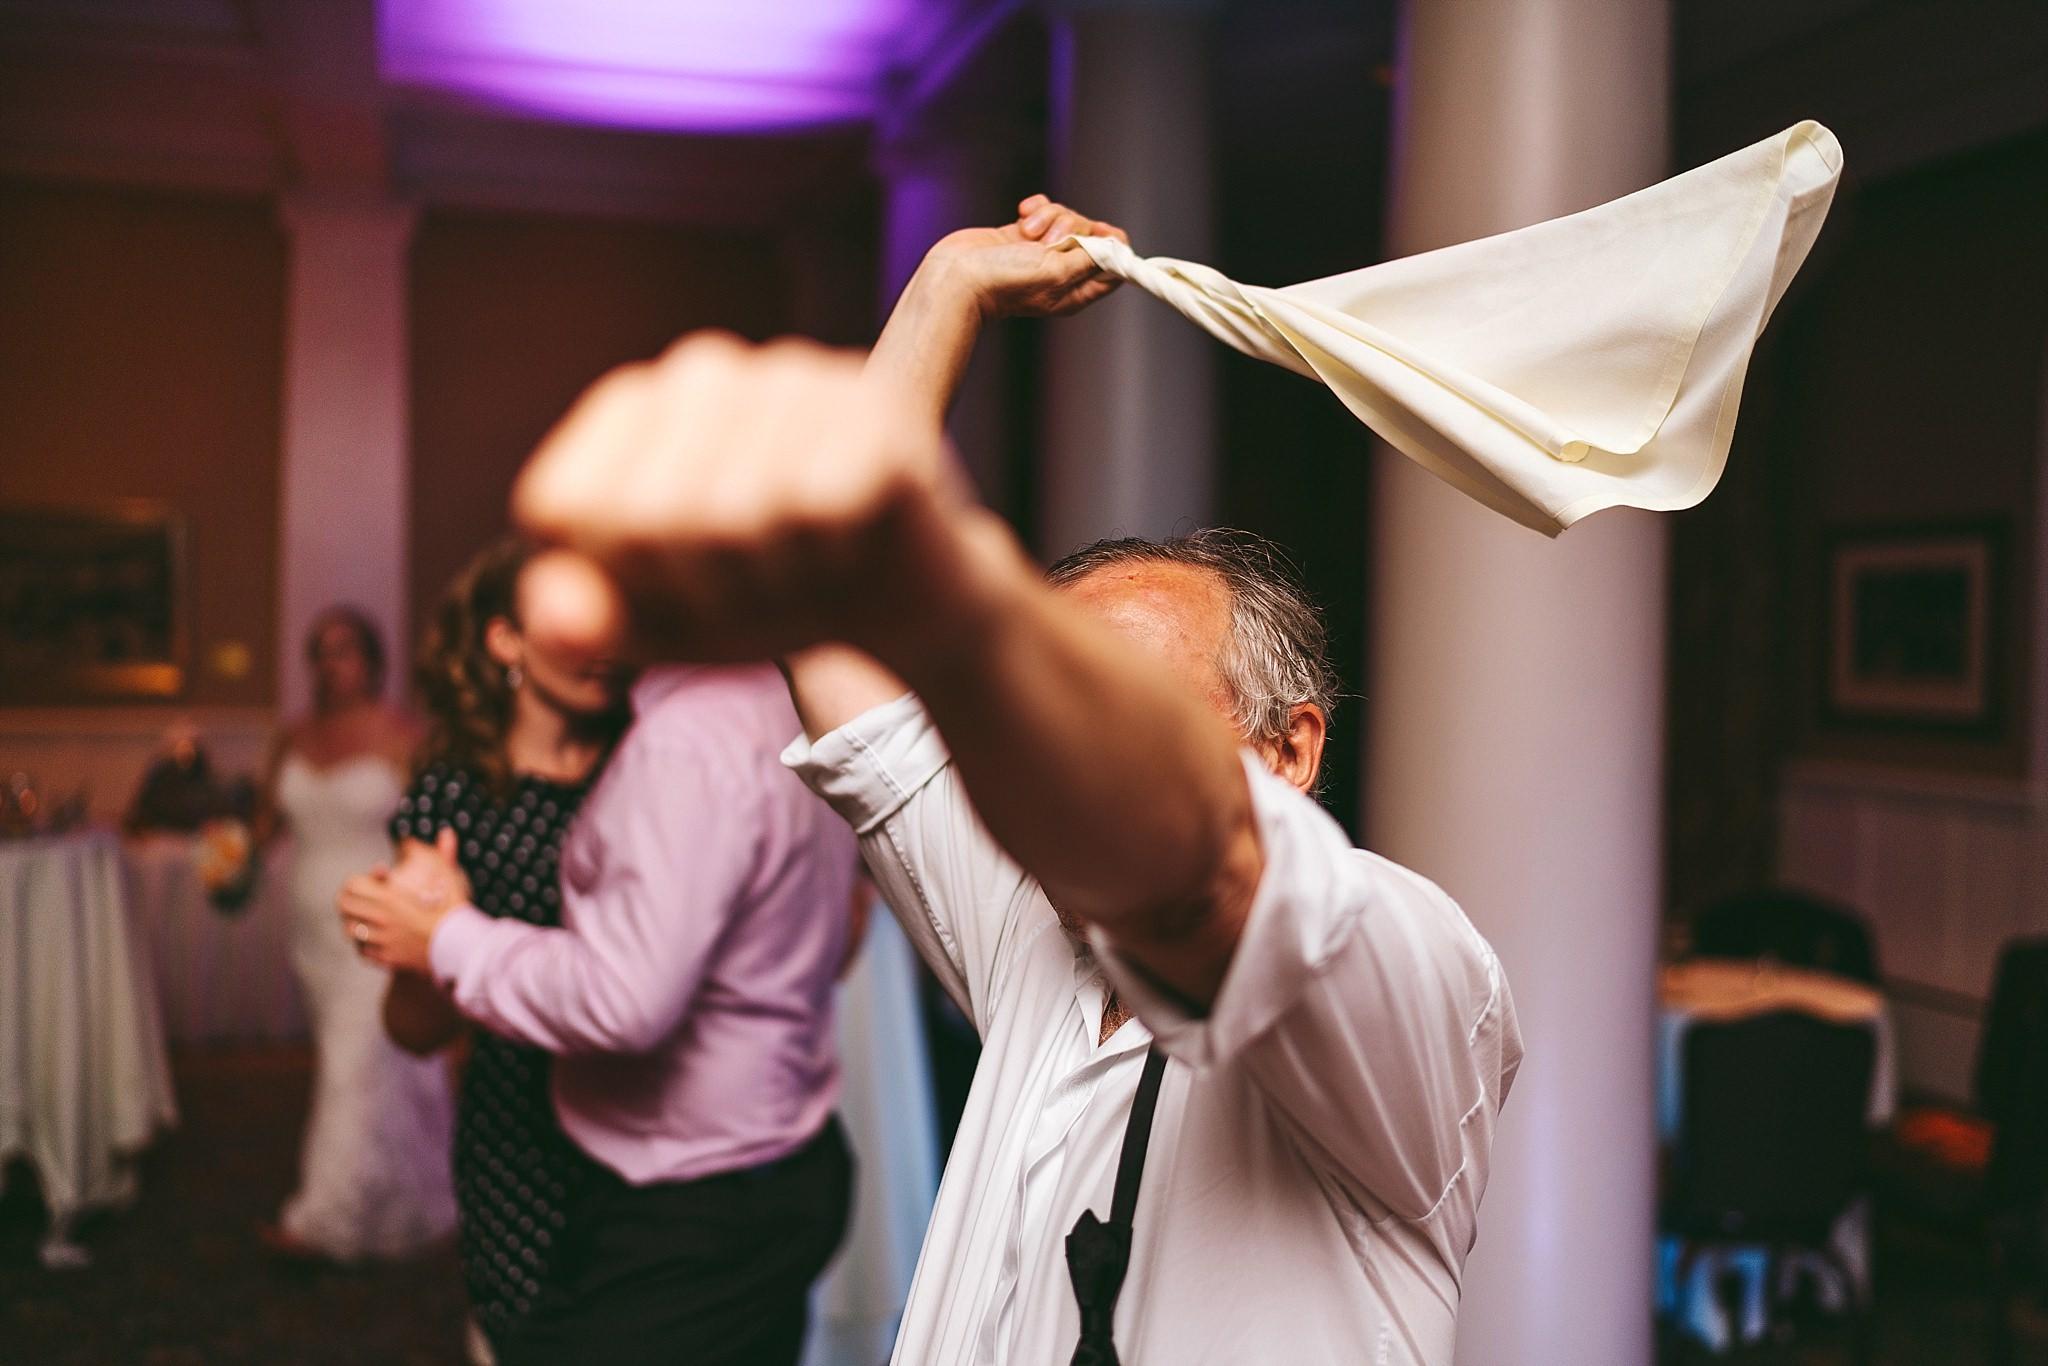 aga-tomaszek-wedding-photographer-cardiff-2016_1030